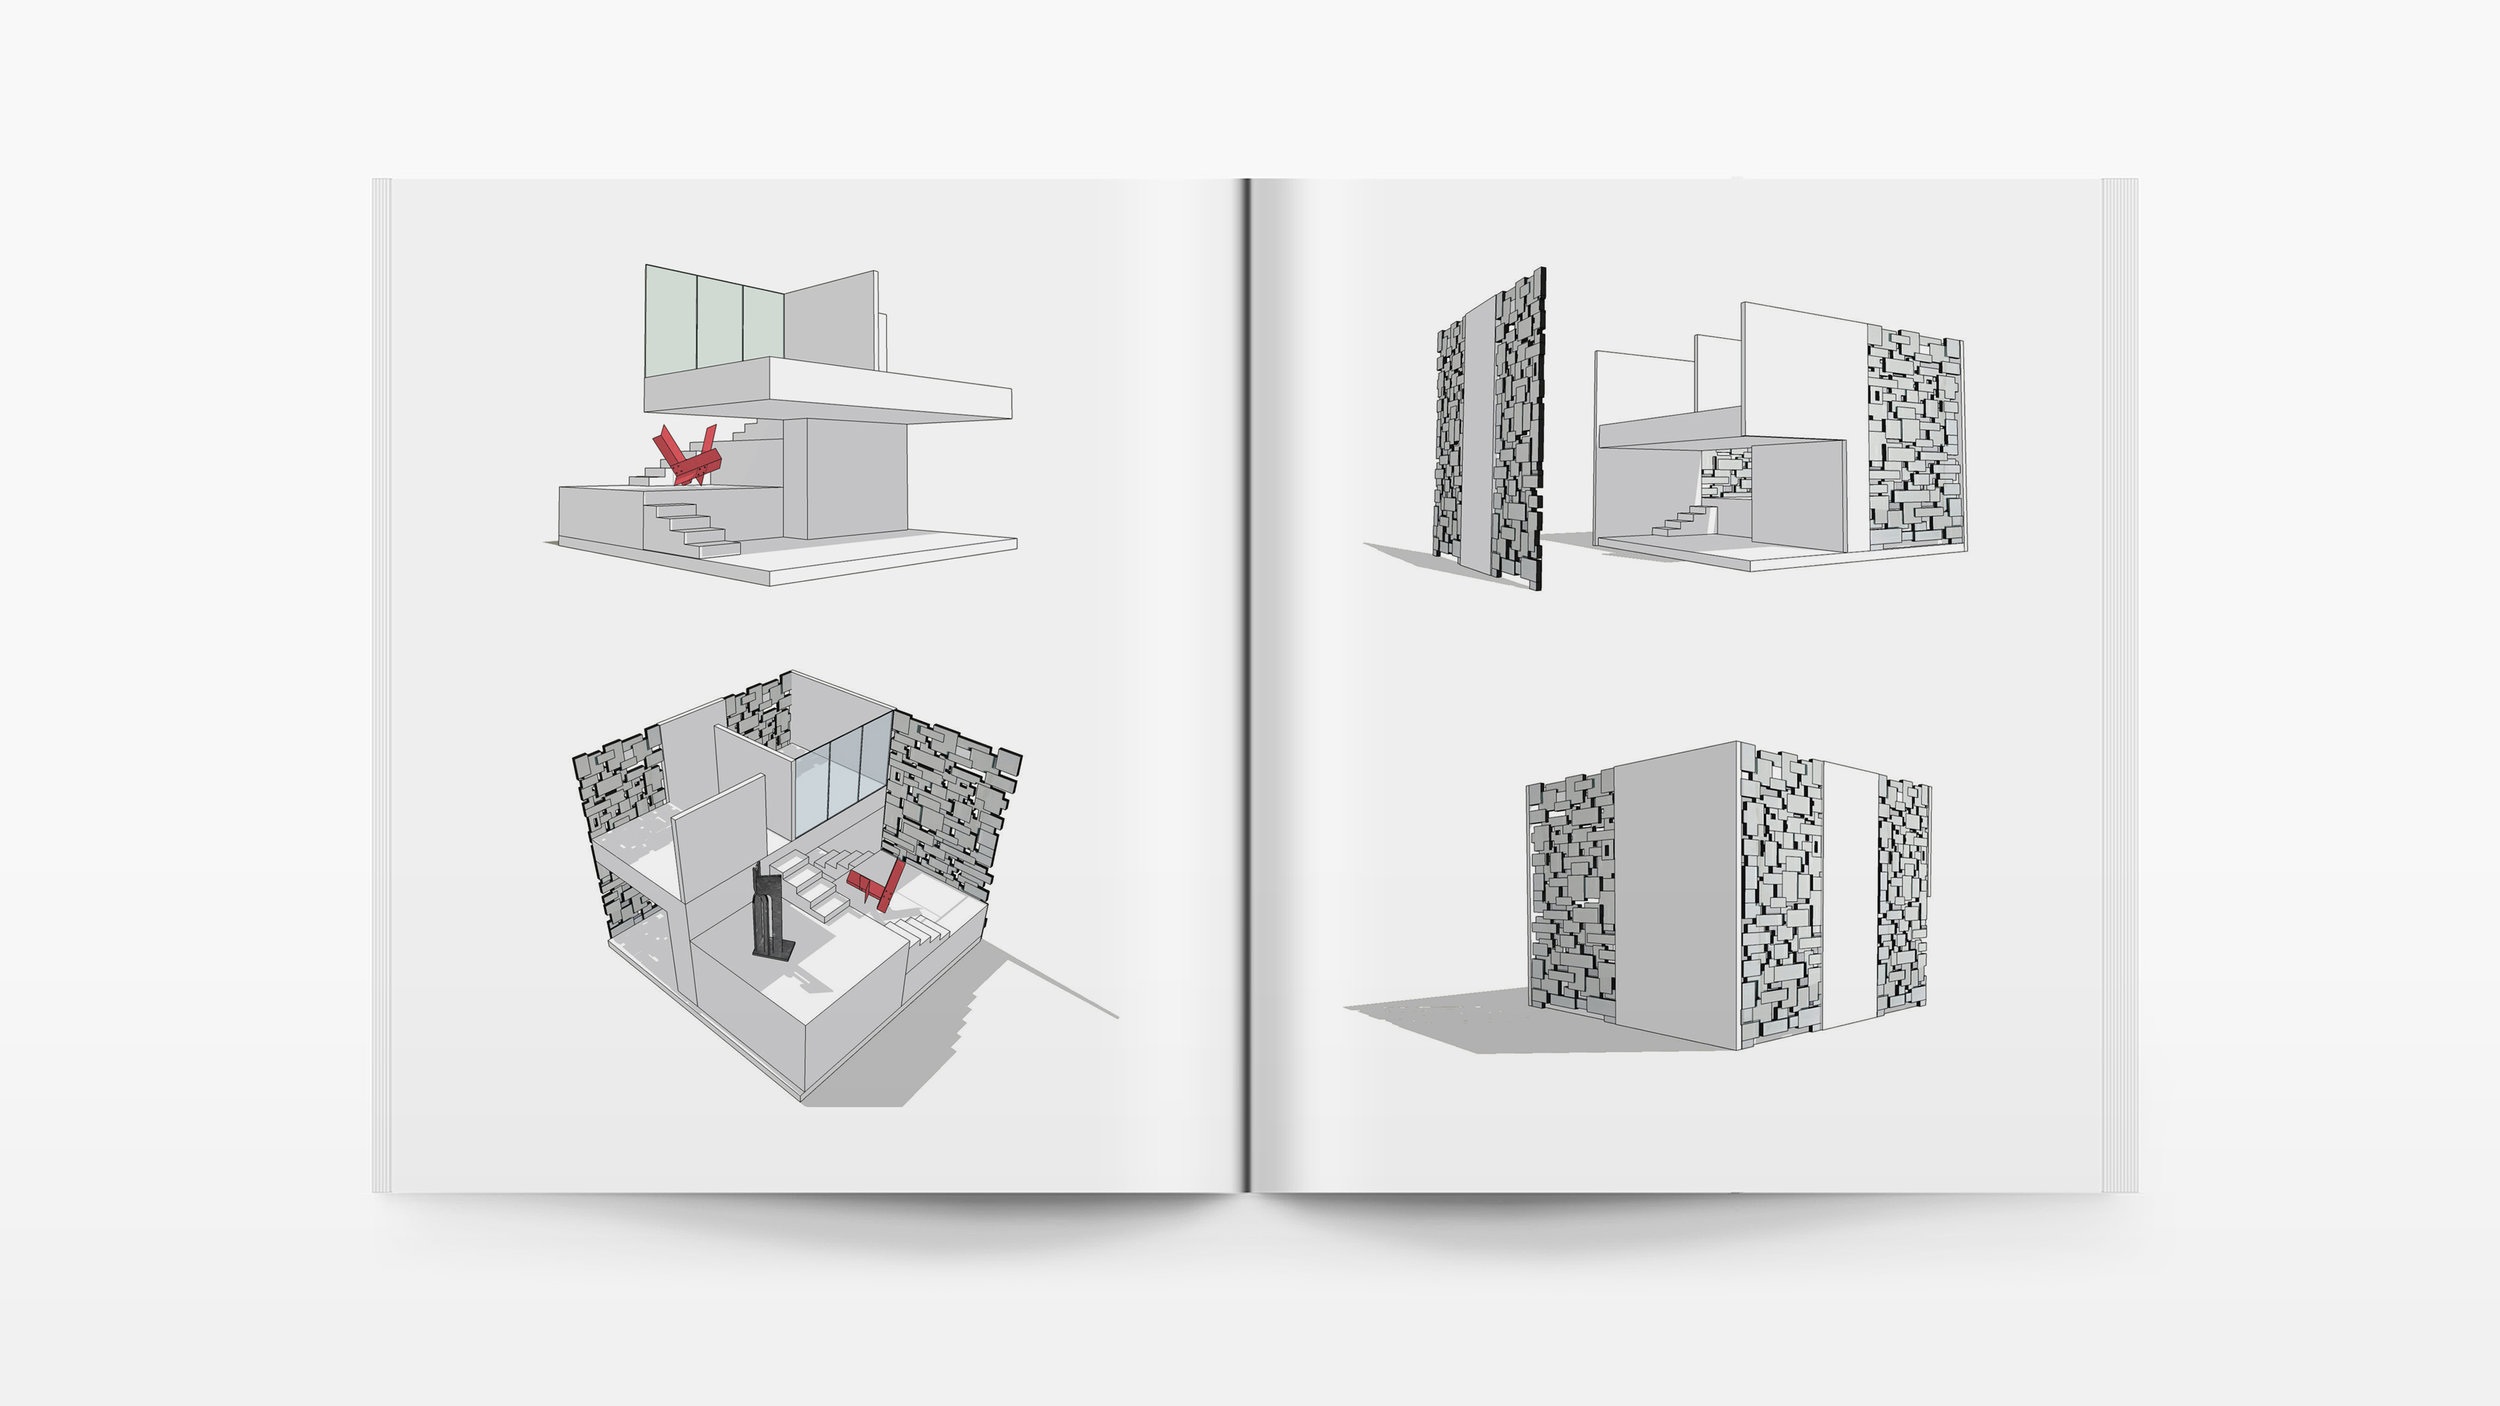 Brand_republica_FNB_exhibition_stand_concept_design_01.jpg